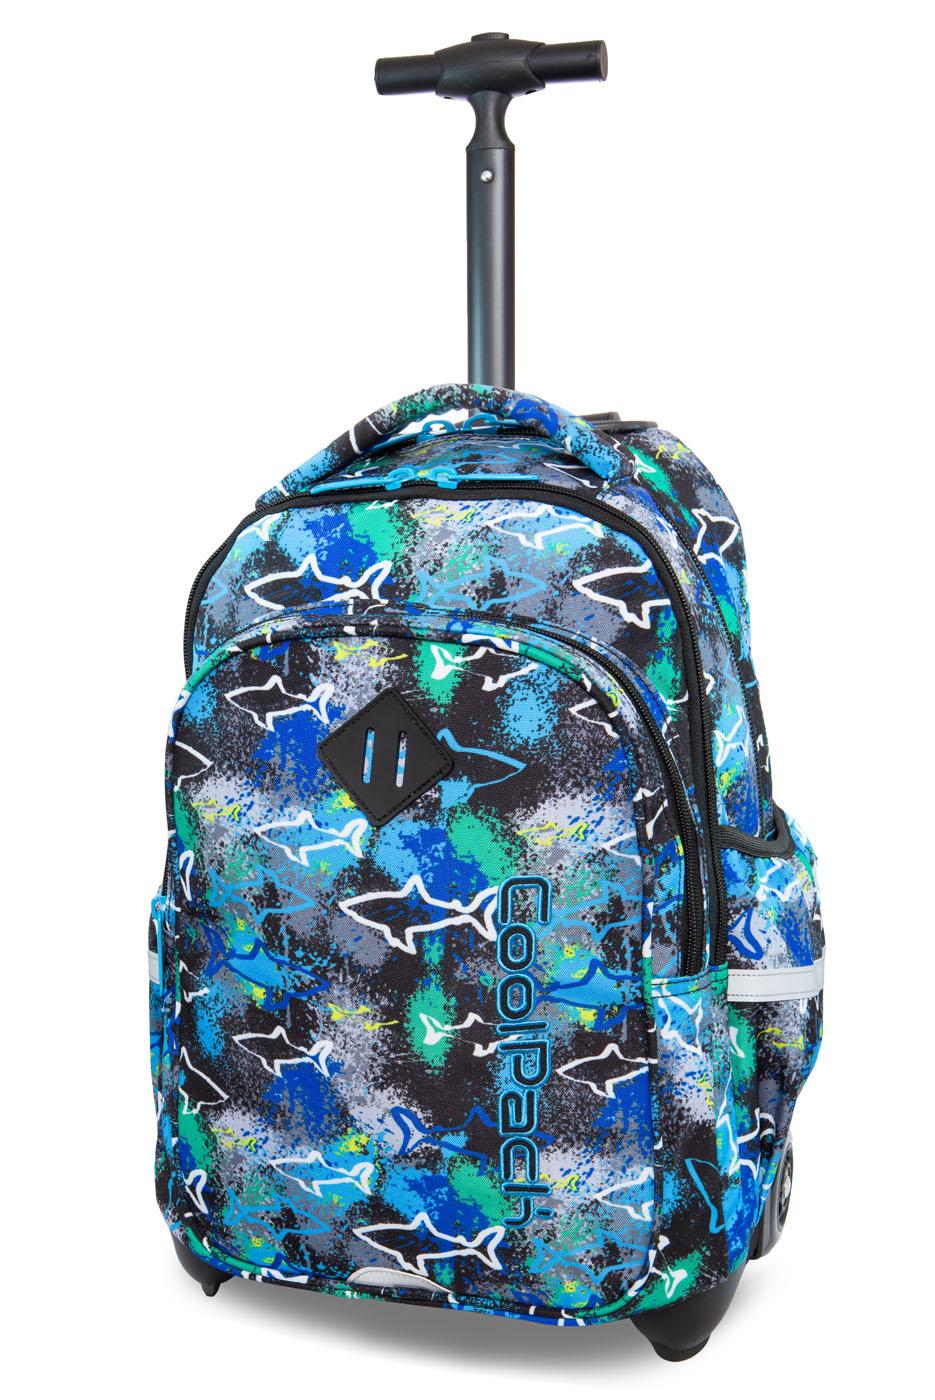 Coolpack   junior   rygsæk med hjul   sharks